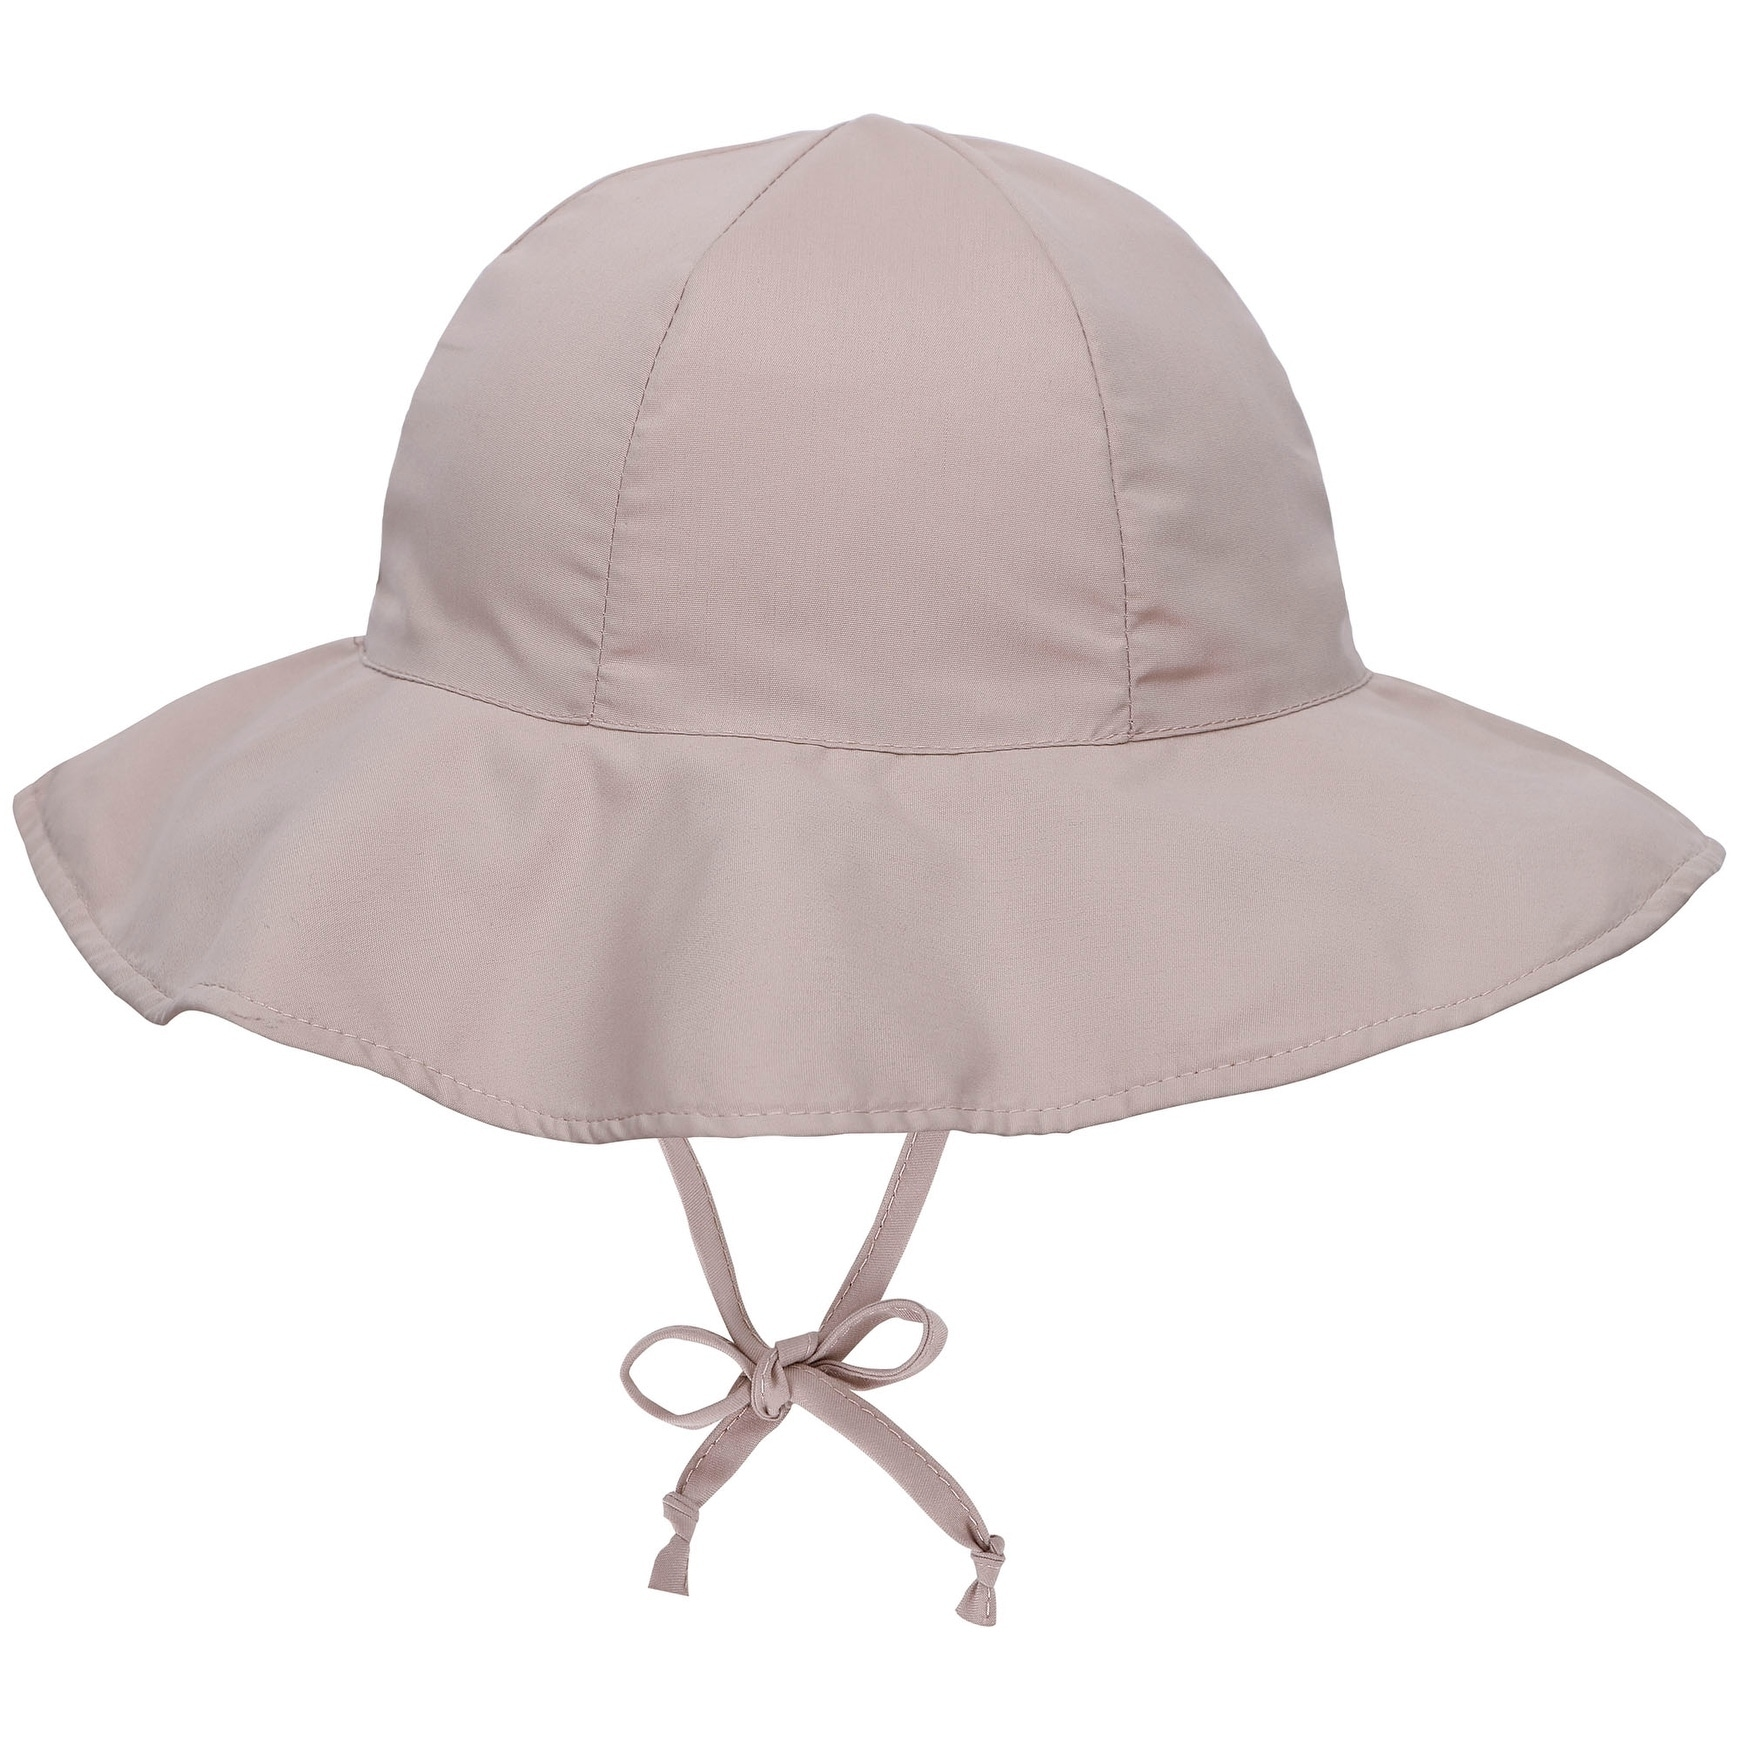 UPF 50 UV Protection Wide Brim Baby Sun Hat  f552756a5ca